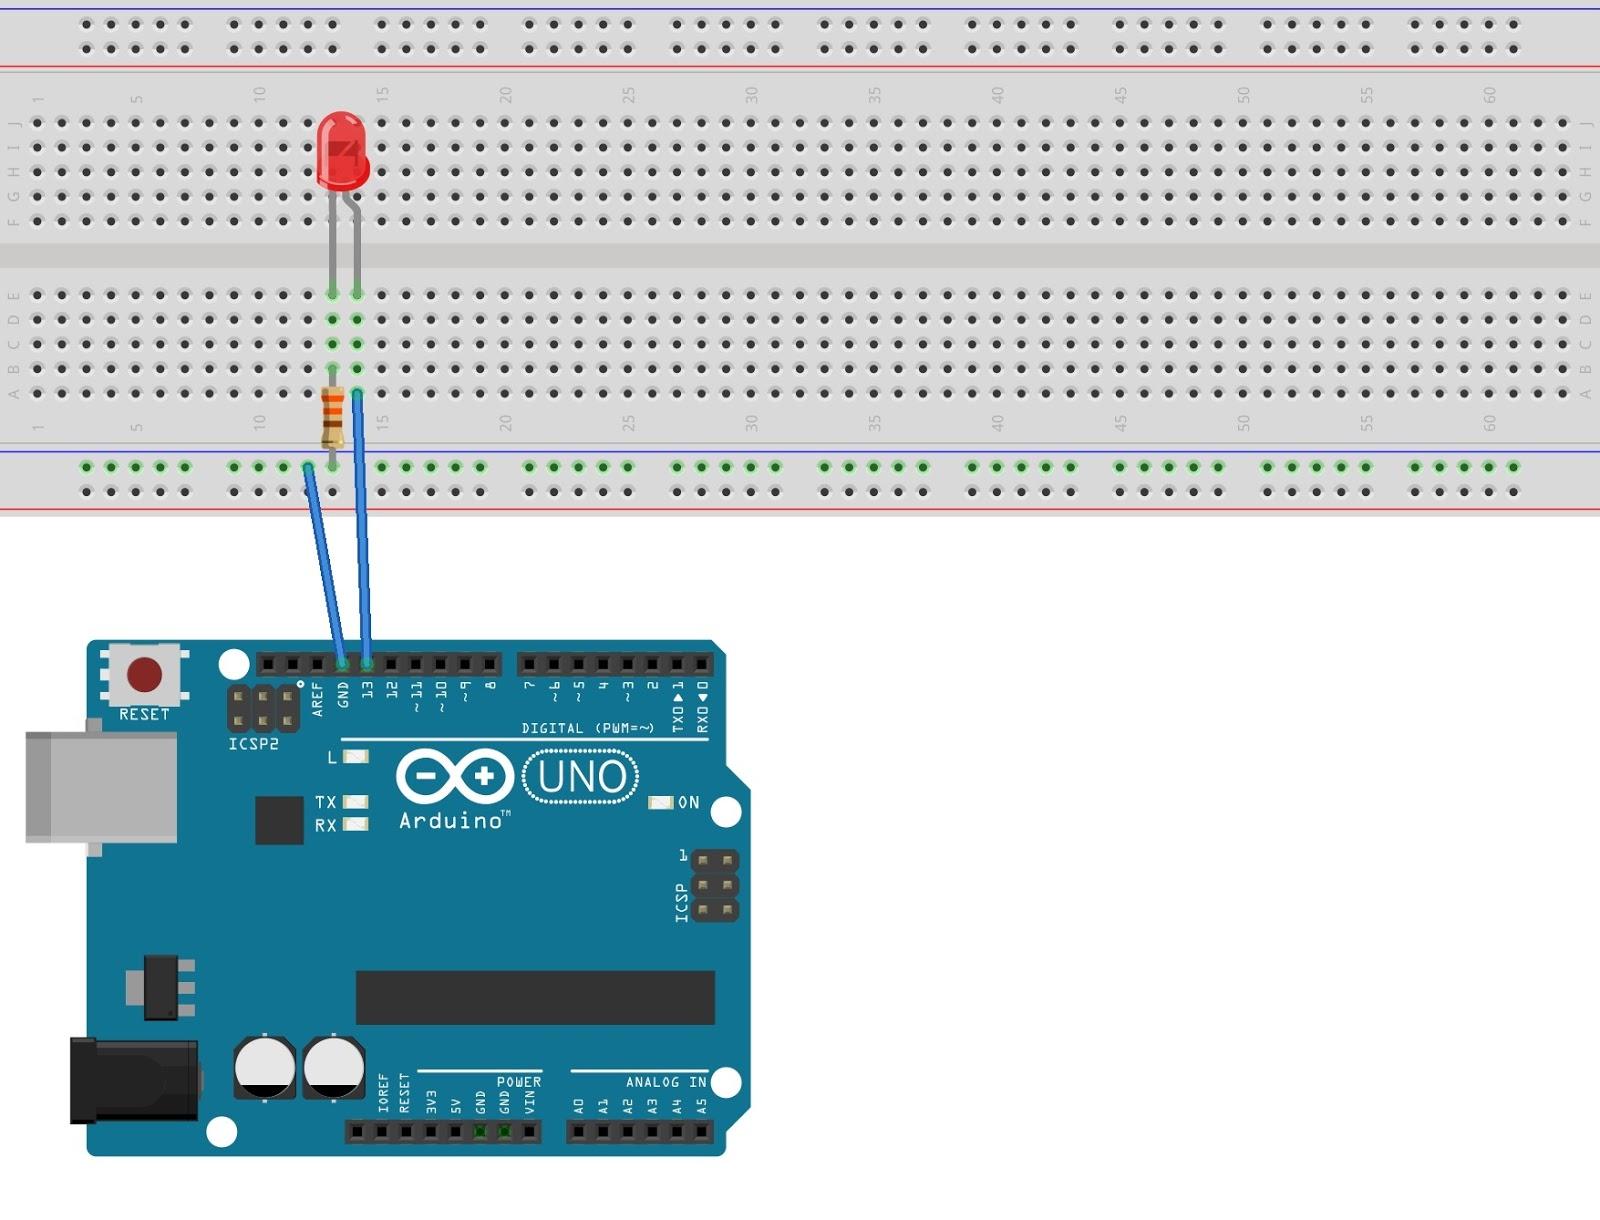 Single Led Blinking Program By Arduino Flasher Circuit